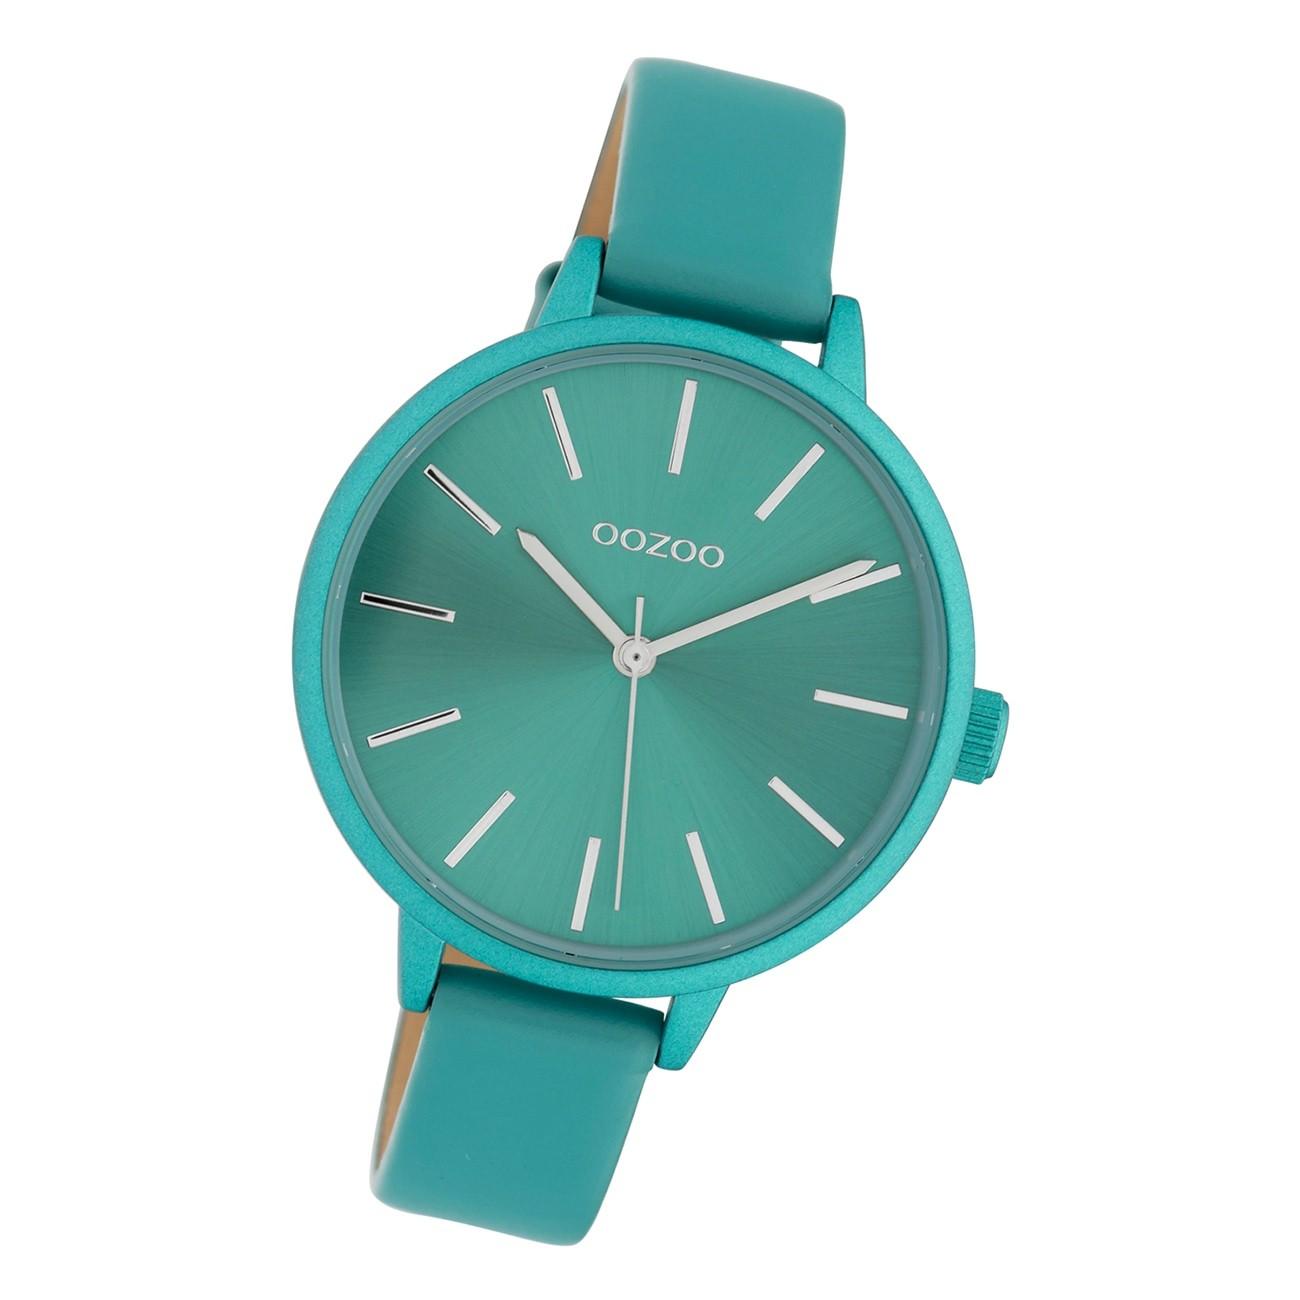 Oozoo Damen Armbanduhr Timepieces C10259 Analog Leder türkis UOC10259